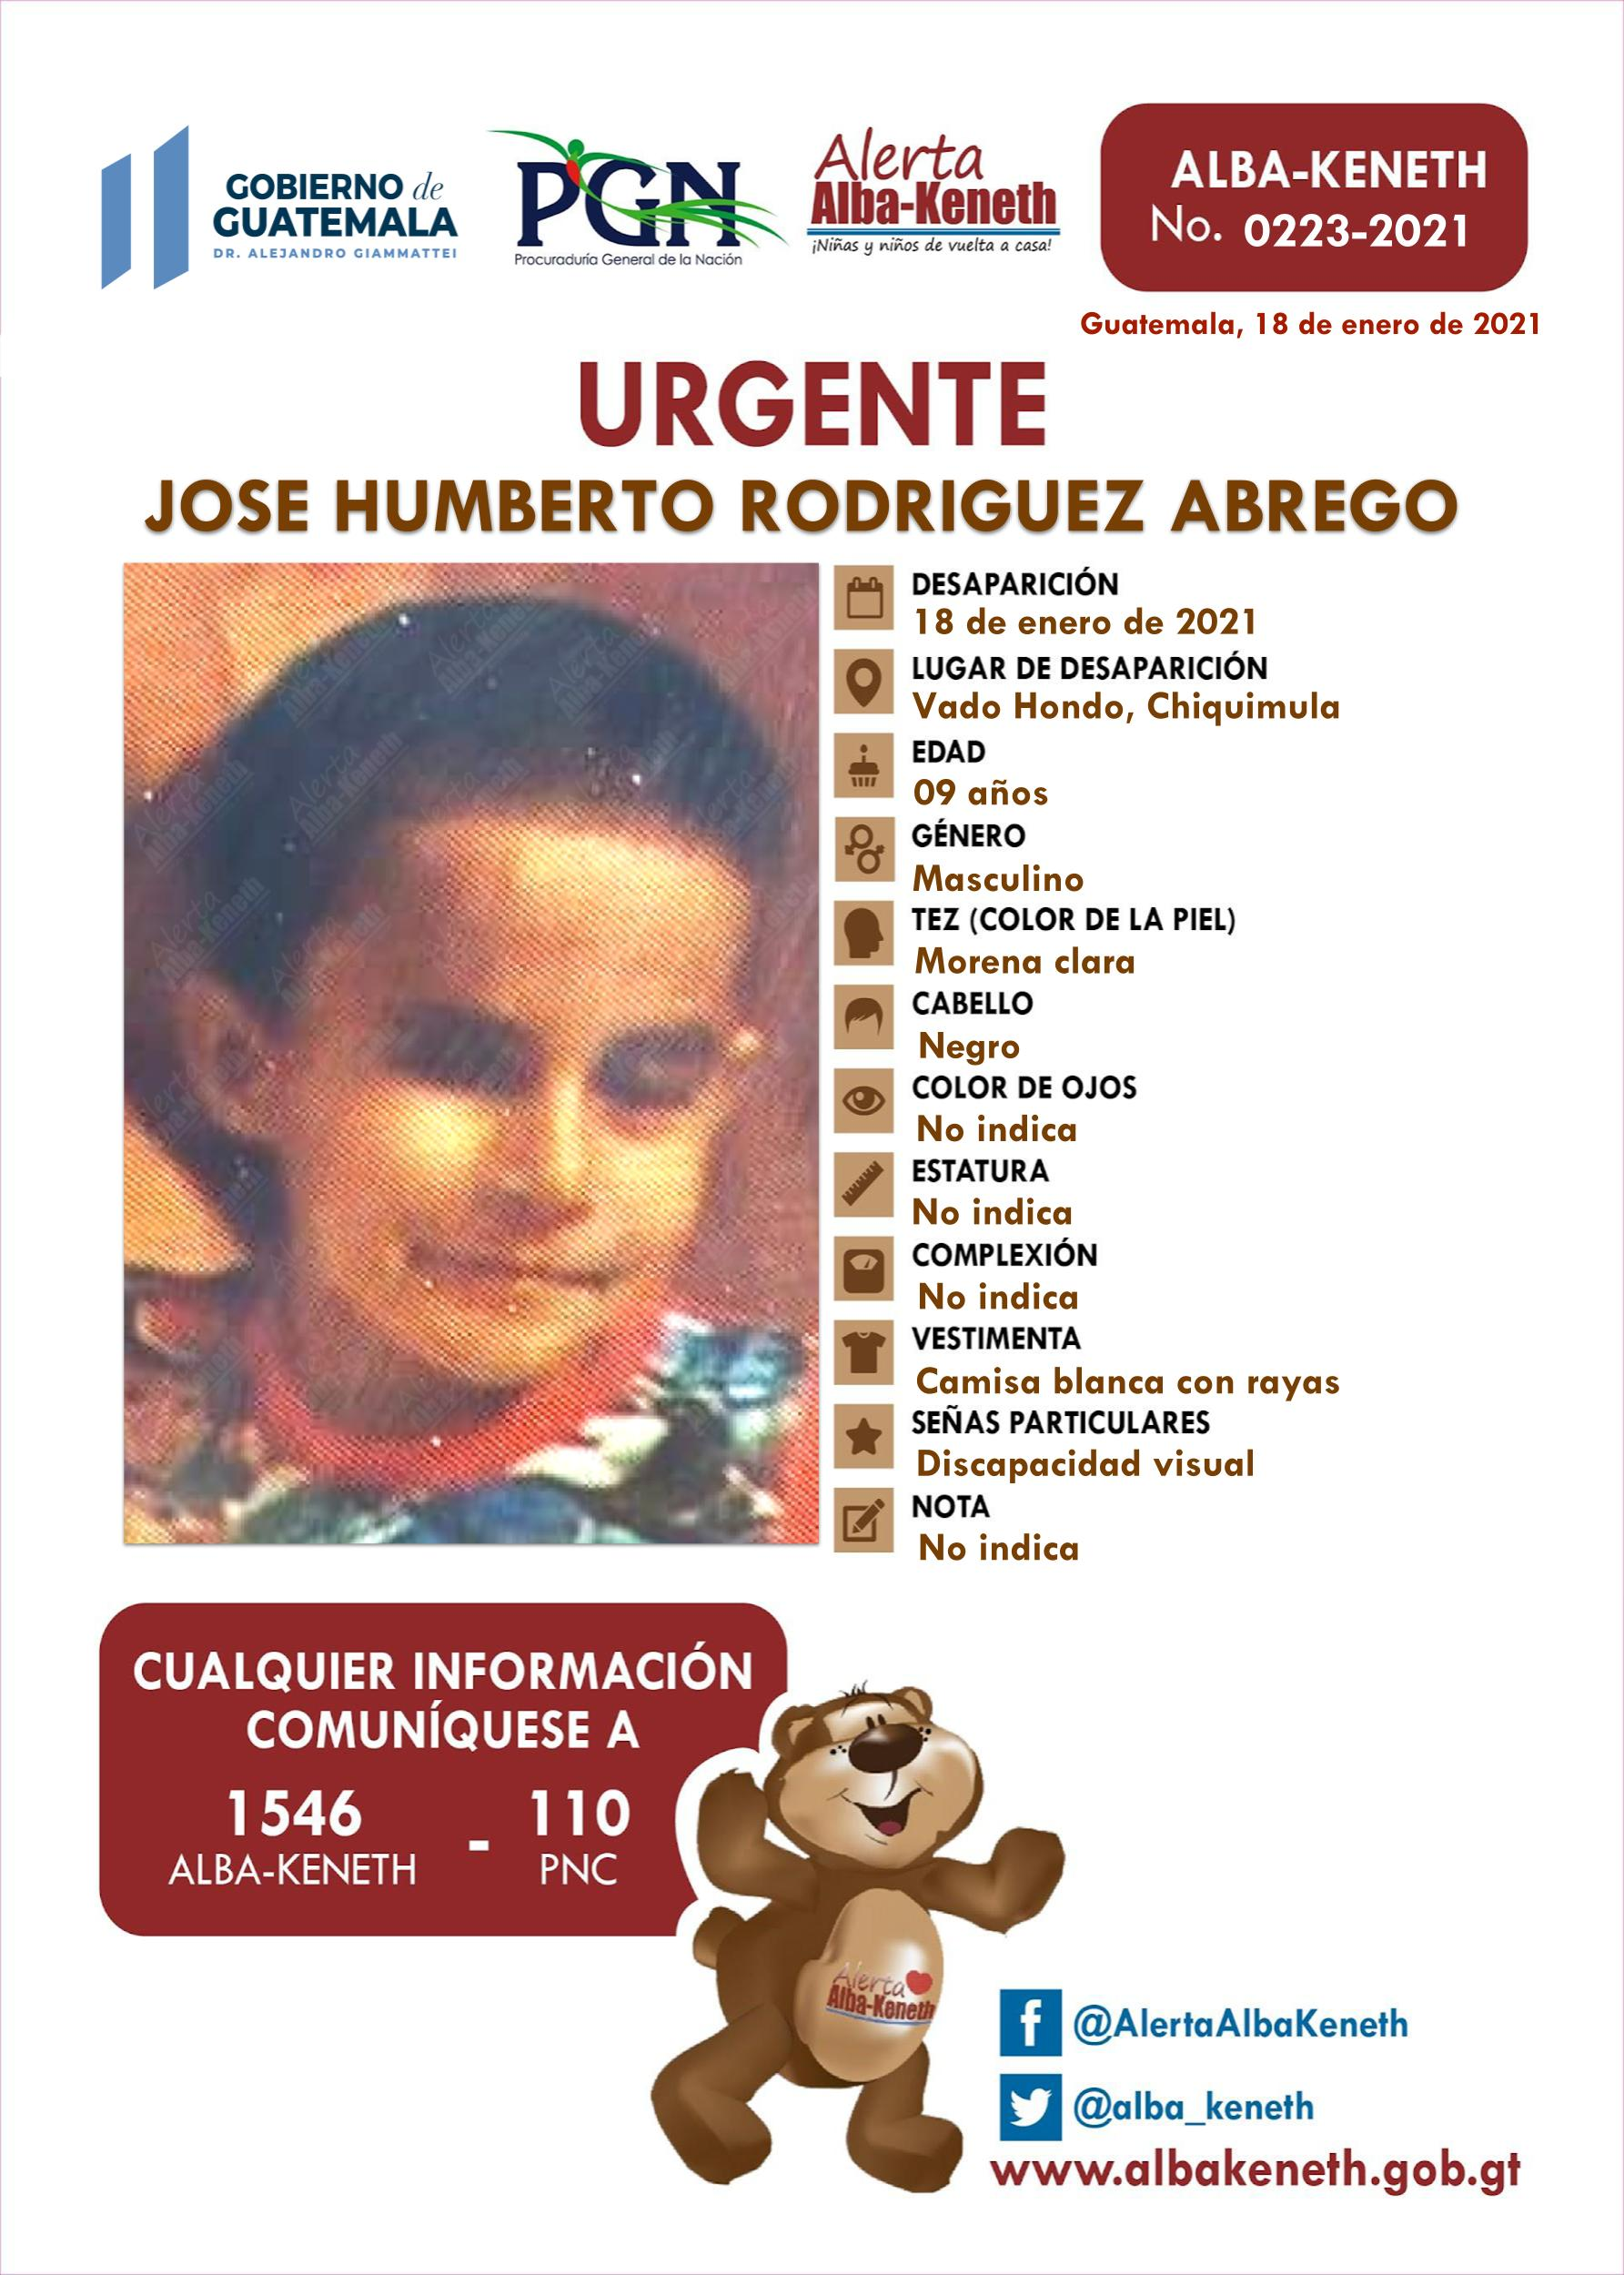 Jose Humberto Rodriguez Abrego